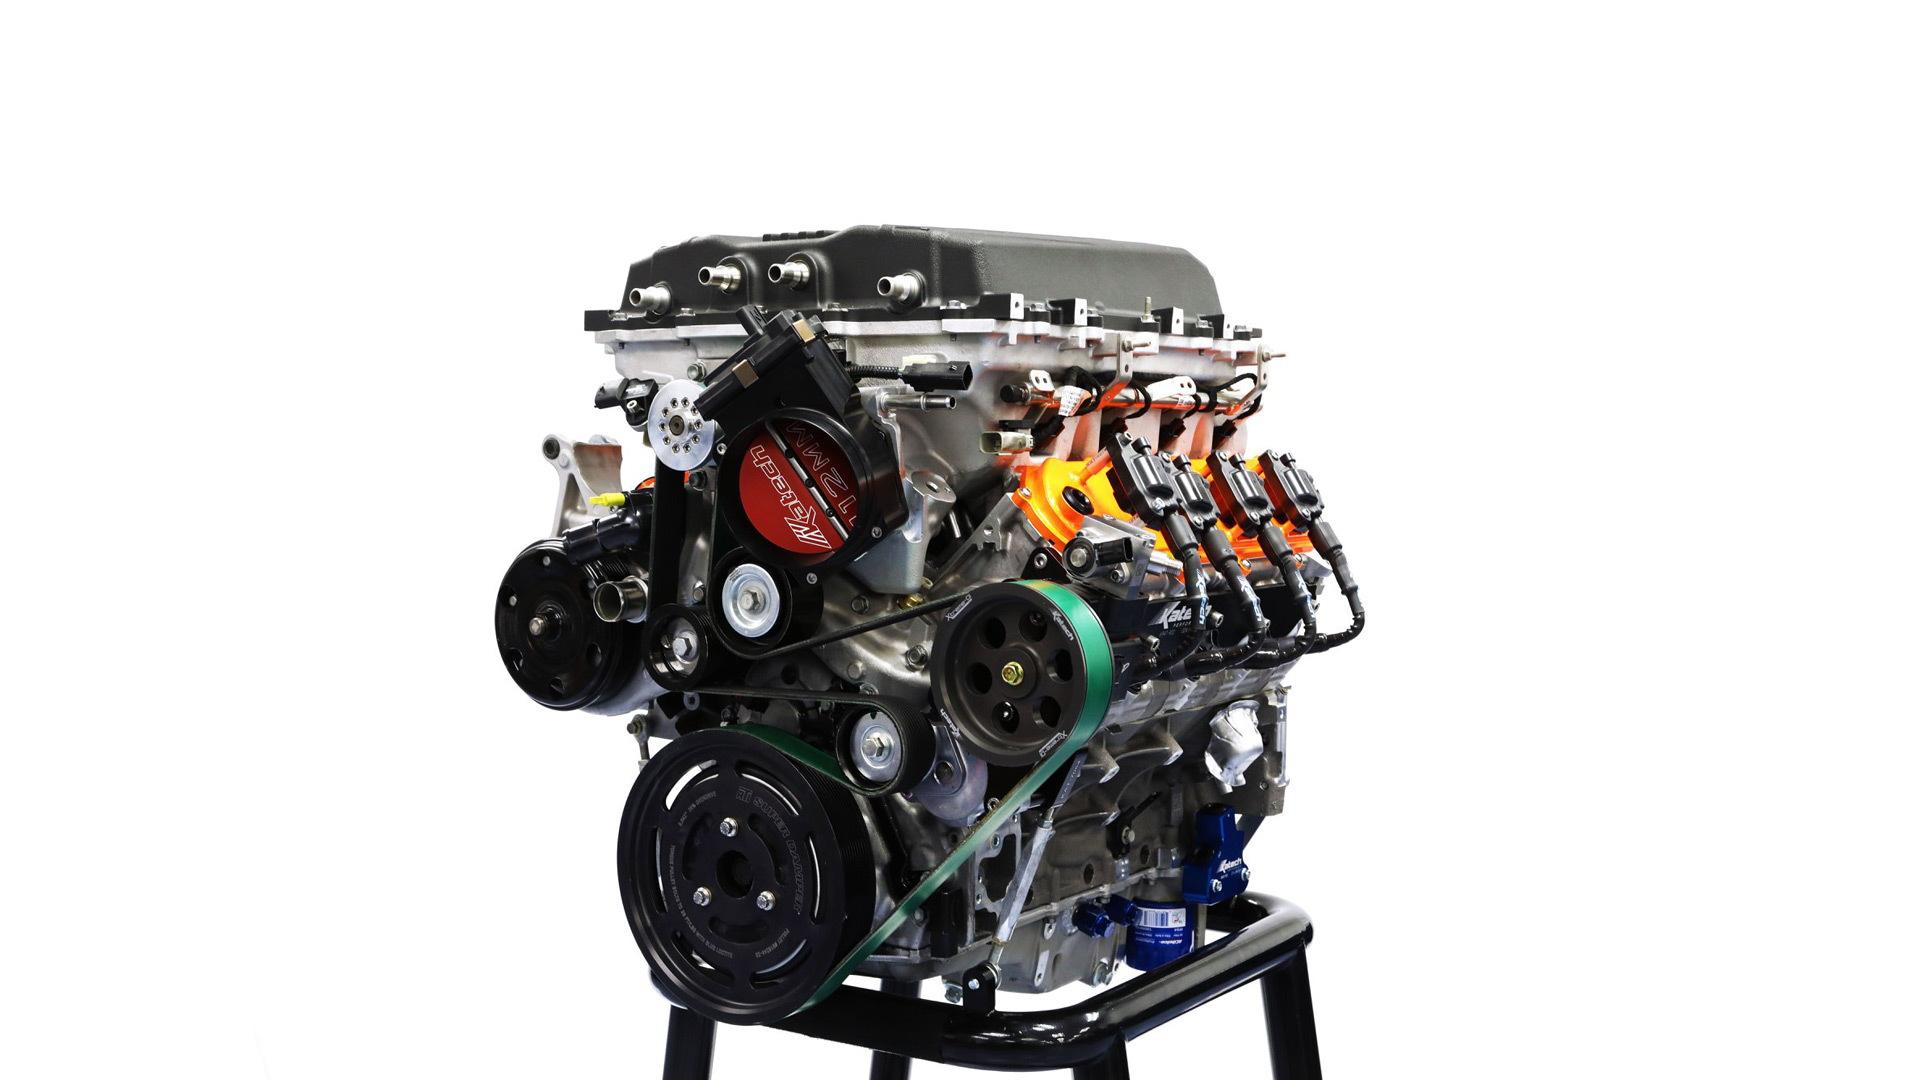 Katech Track Attack LT5 6.35-liter supercharged V-8 crate engine